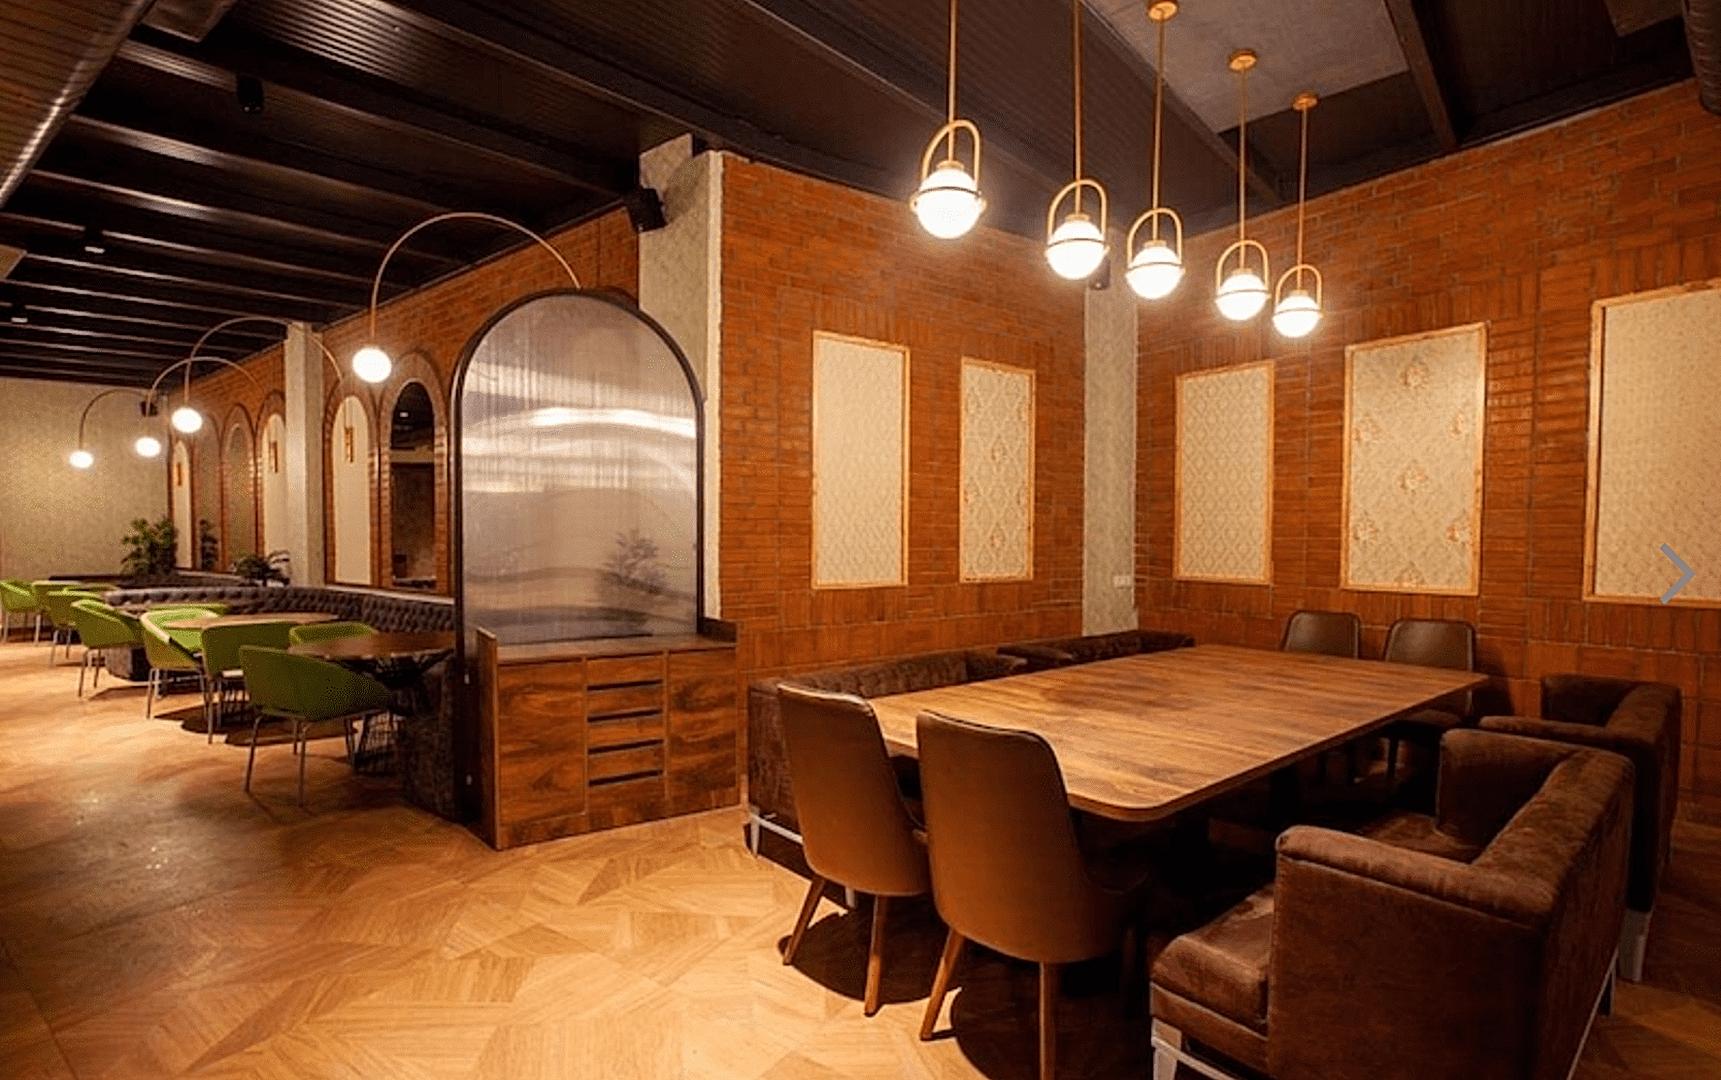 Shiv Sagar Signature -  Restaurant Light